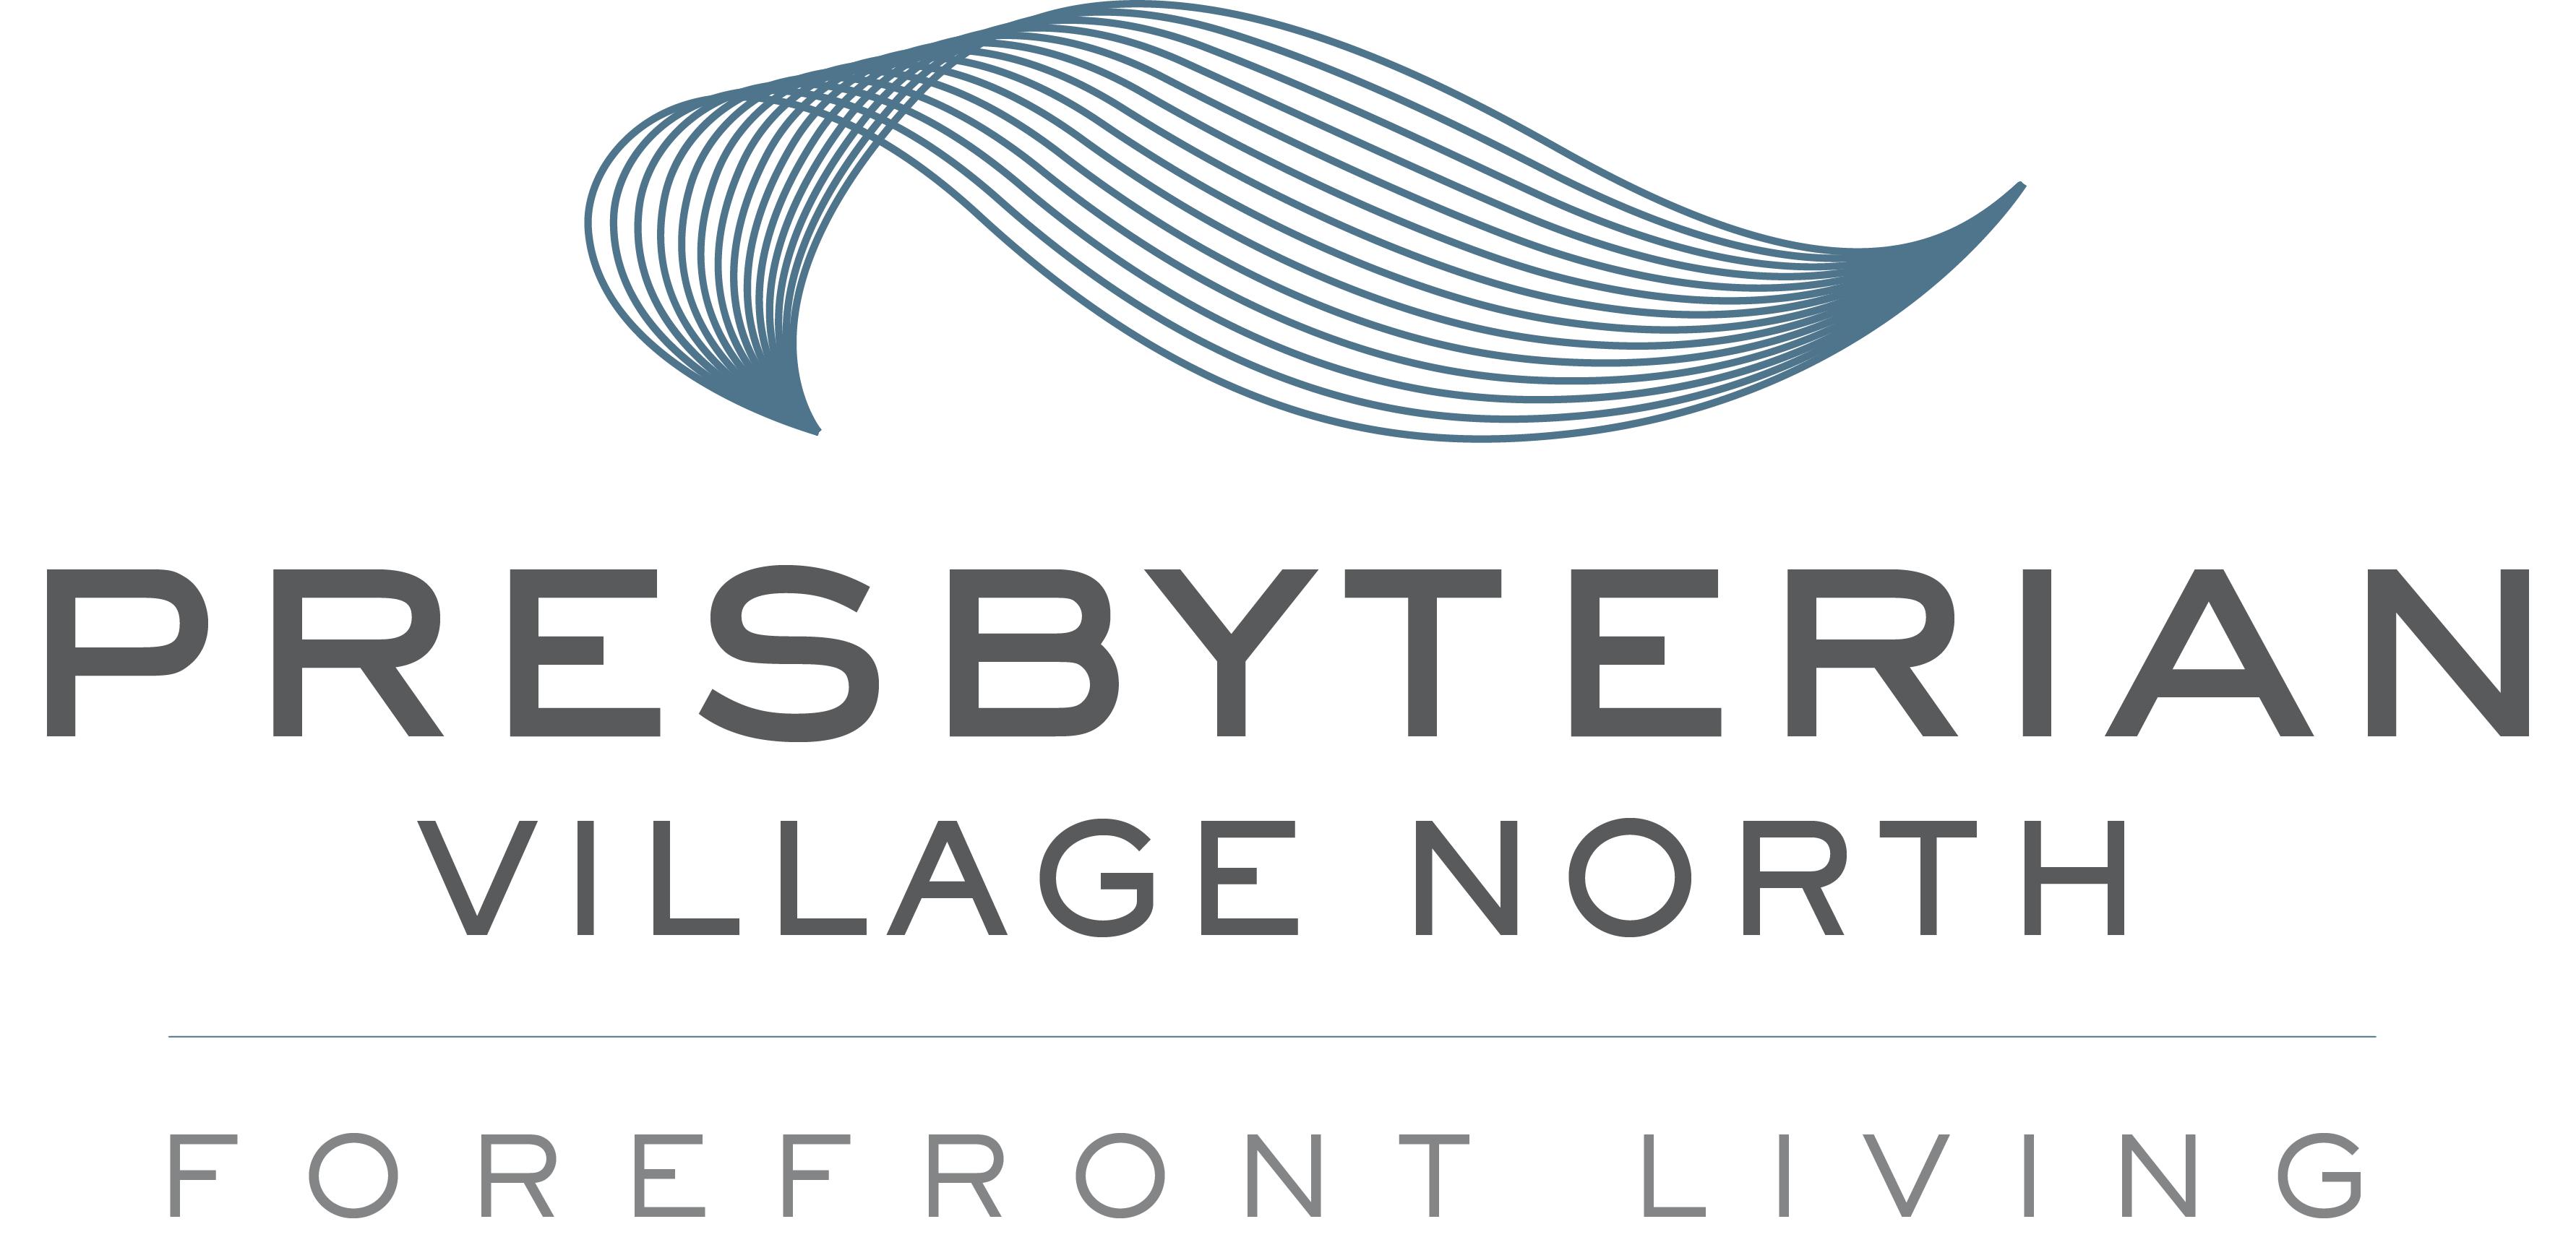 Presbyterian Village North